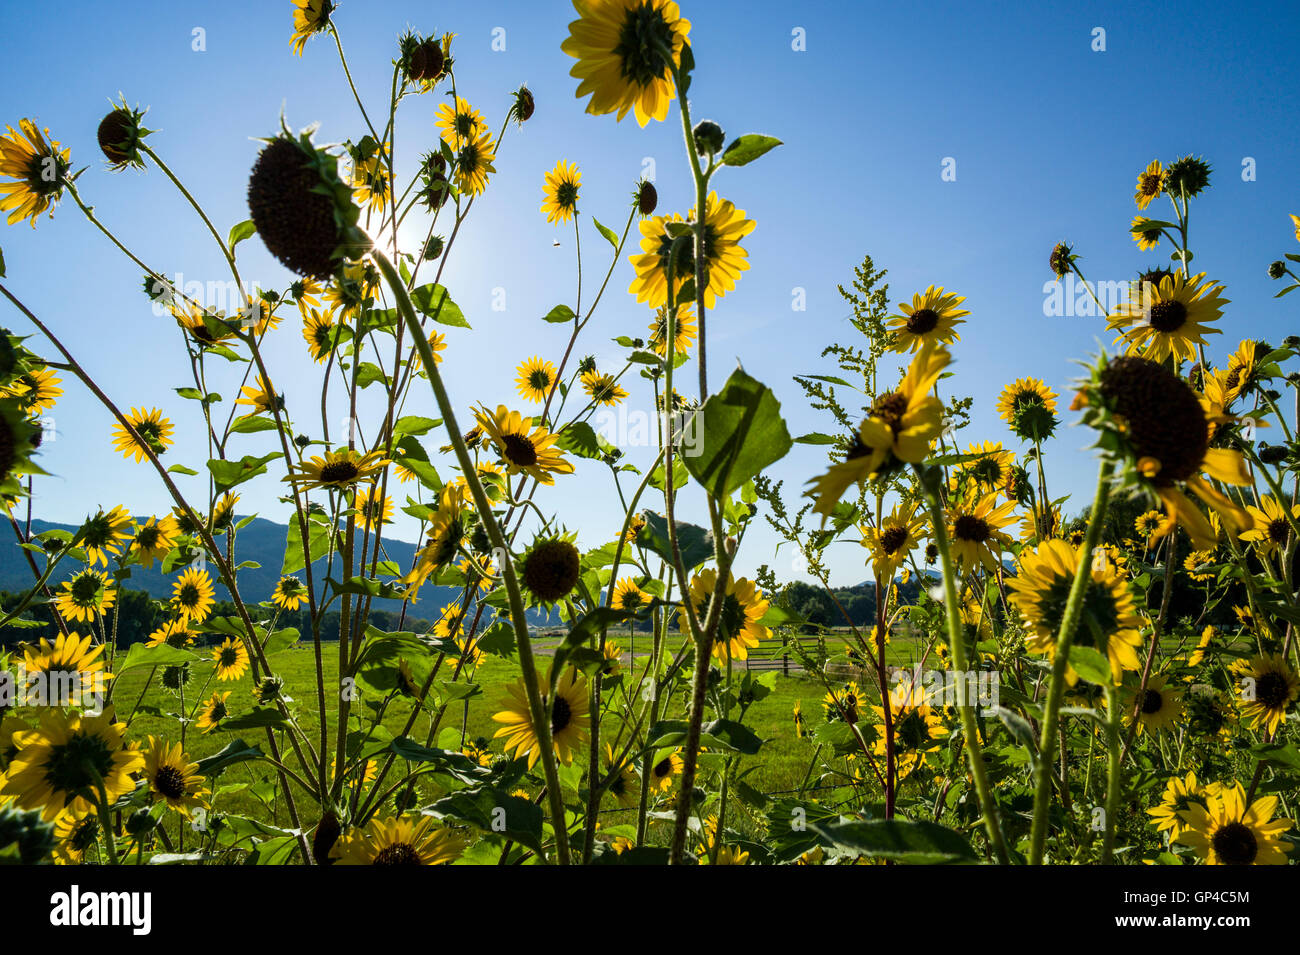 Common Sunflower; Helianthus annuus; Asteraceae; CR108; Salida; Colorado; USA - Stock Image